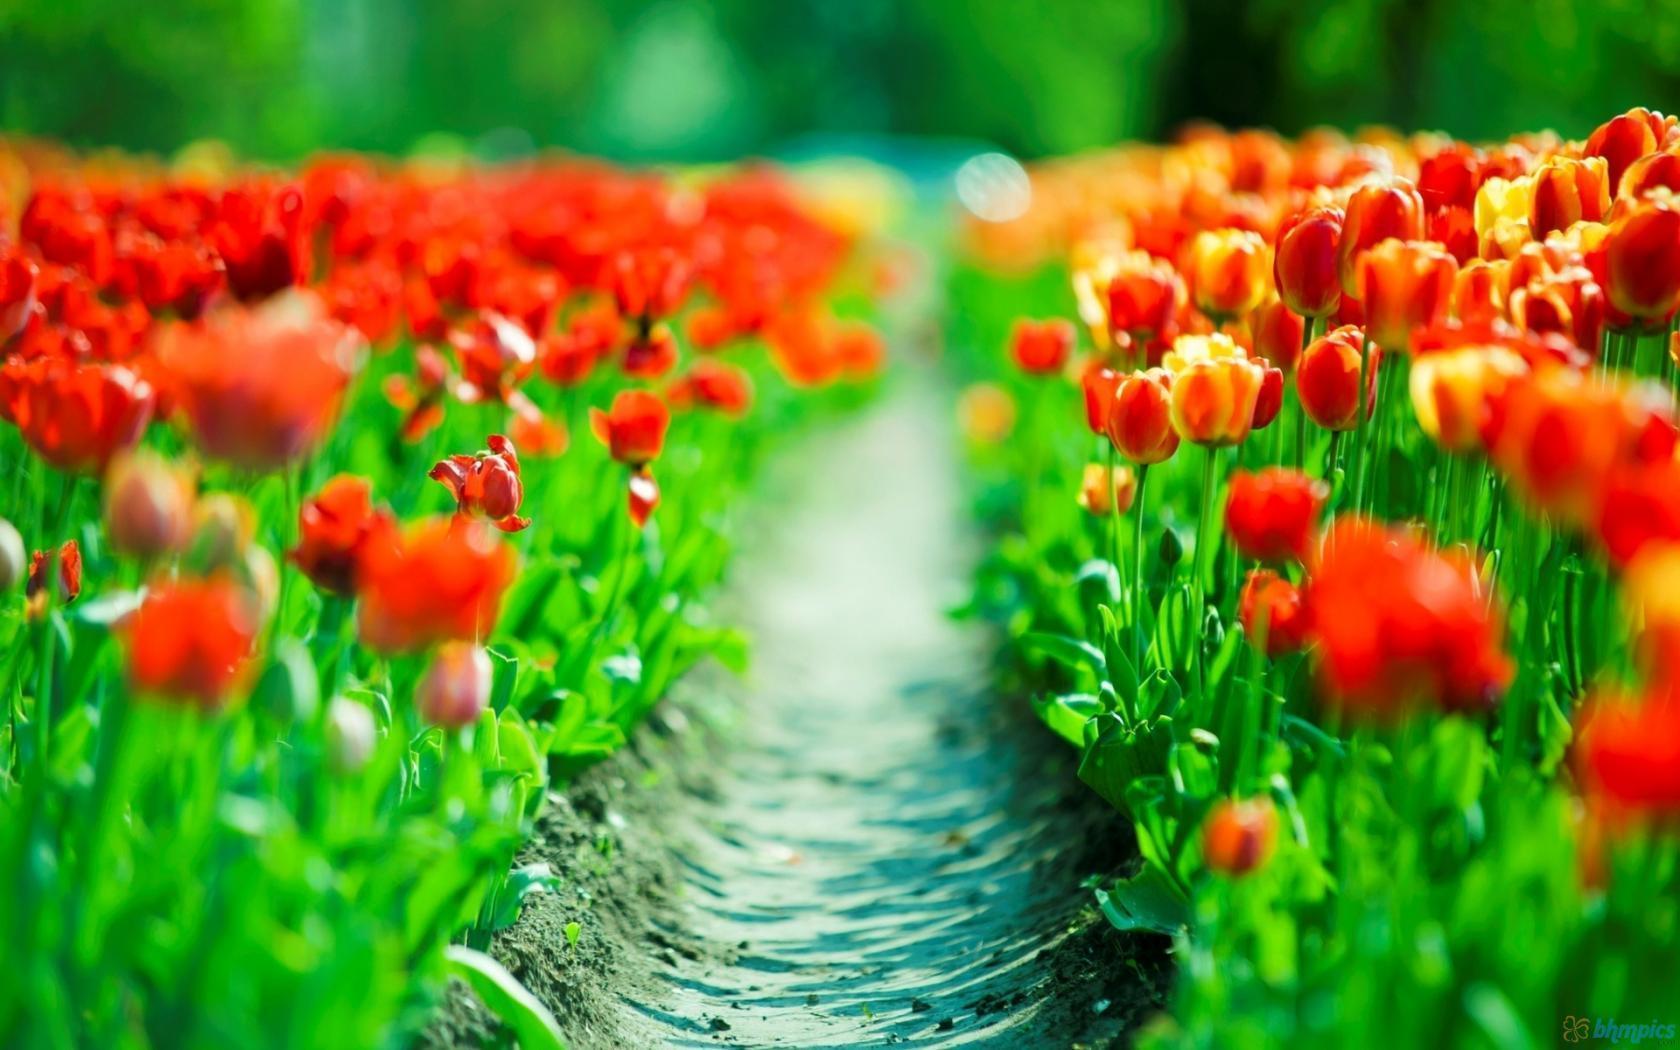 Wallpapers For Desktop Backgrounds Tulip Flowers